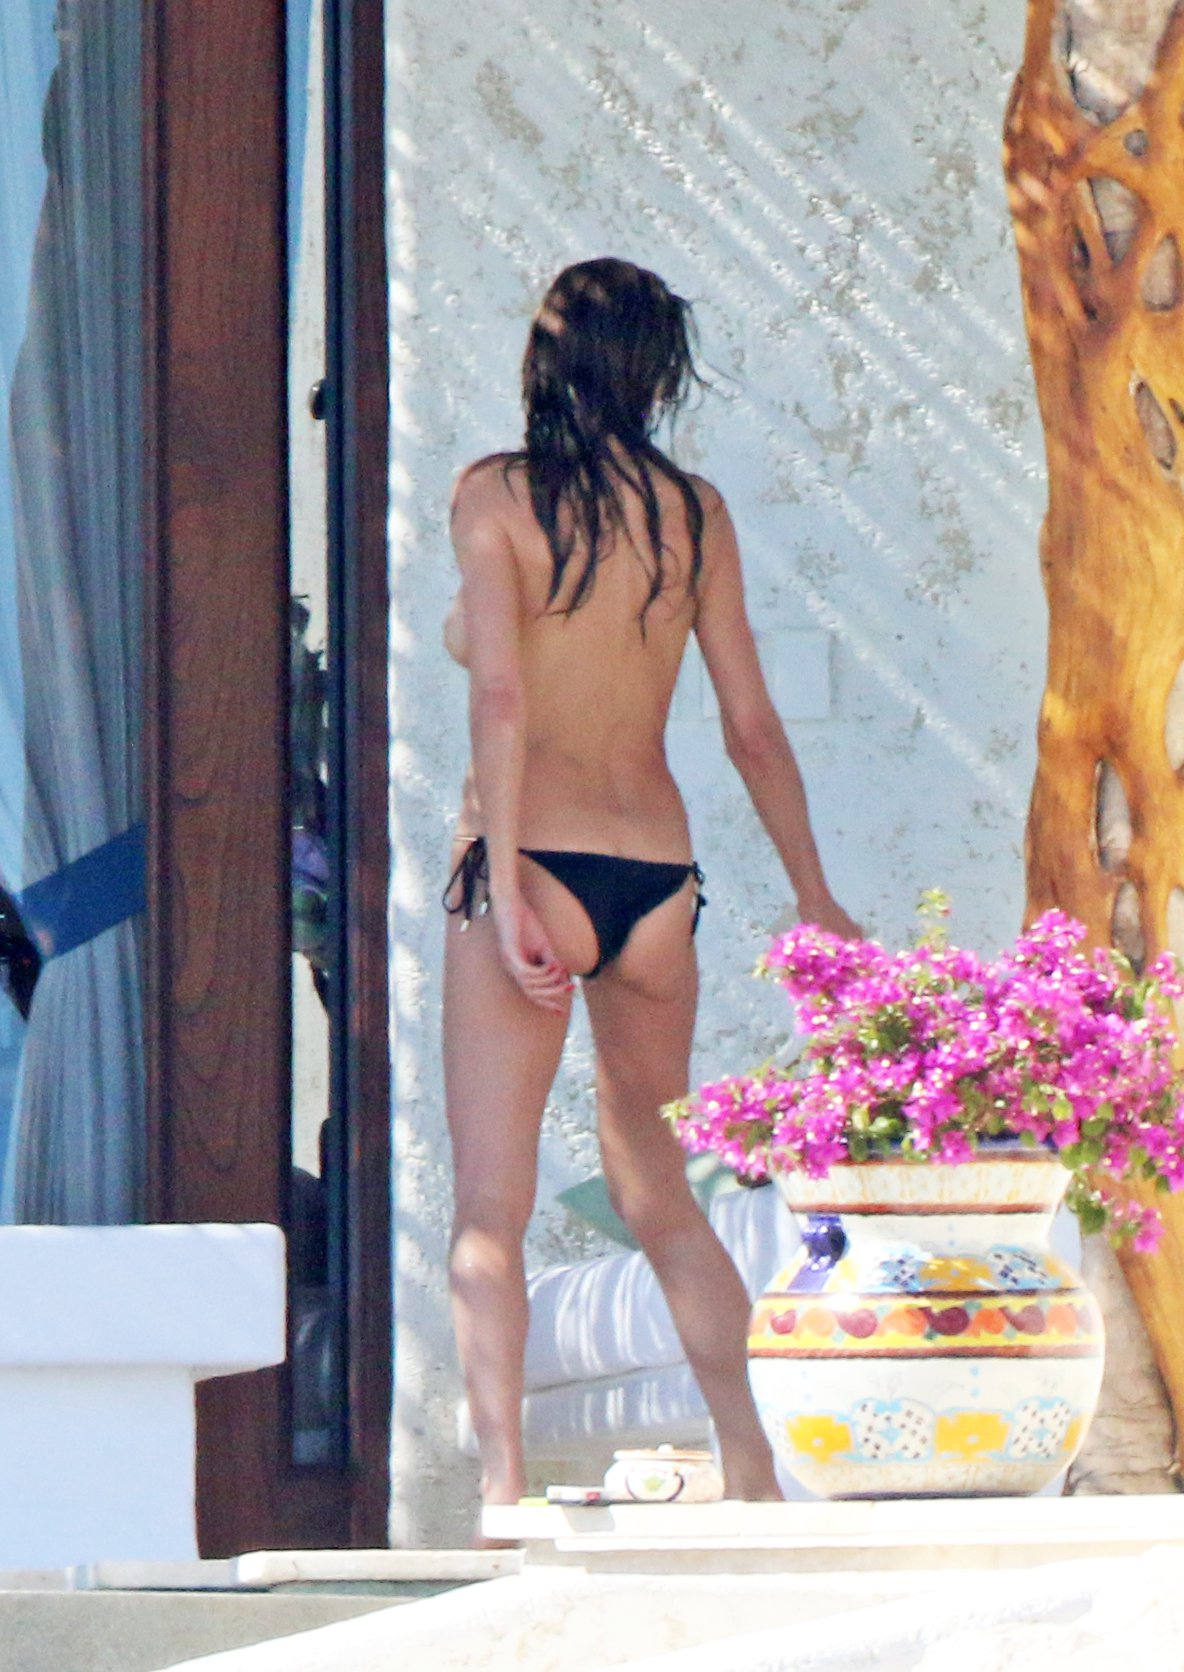 Paparazzi Stefanie Spleiss naked (72 foto and video), Ass, Paparazzi, Selfie, panties 2020